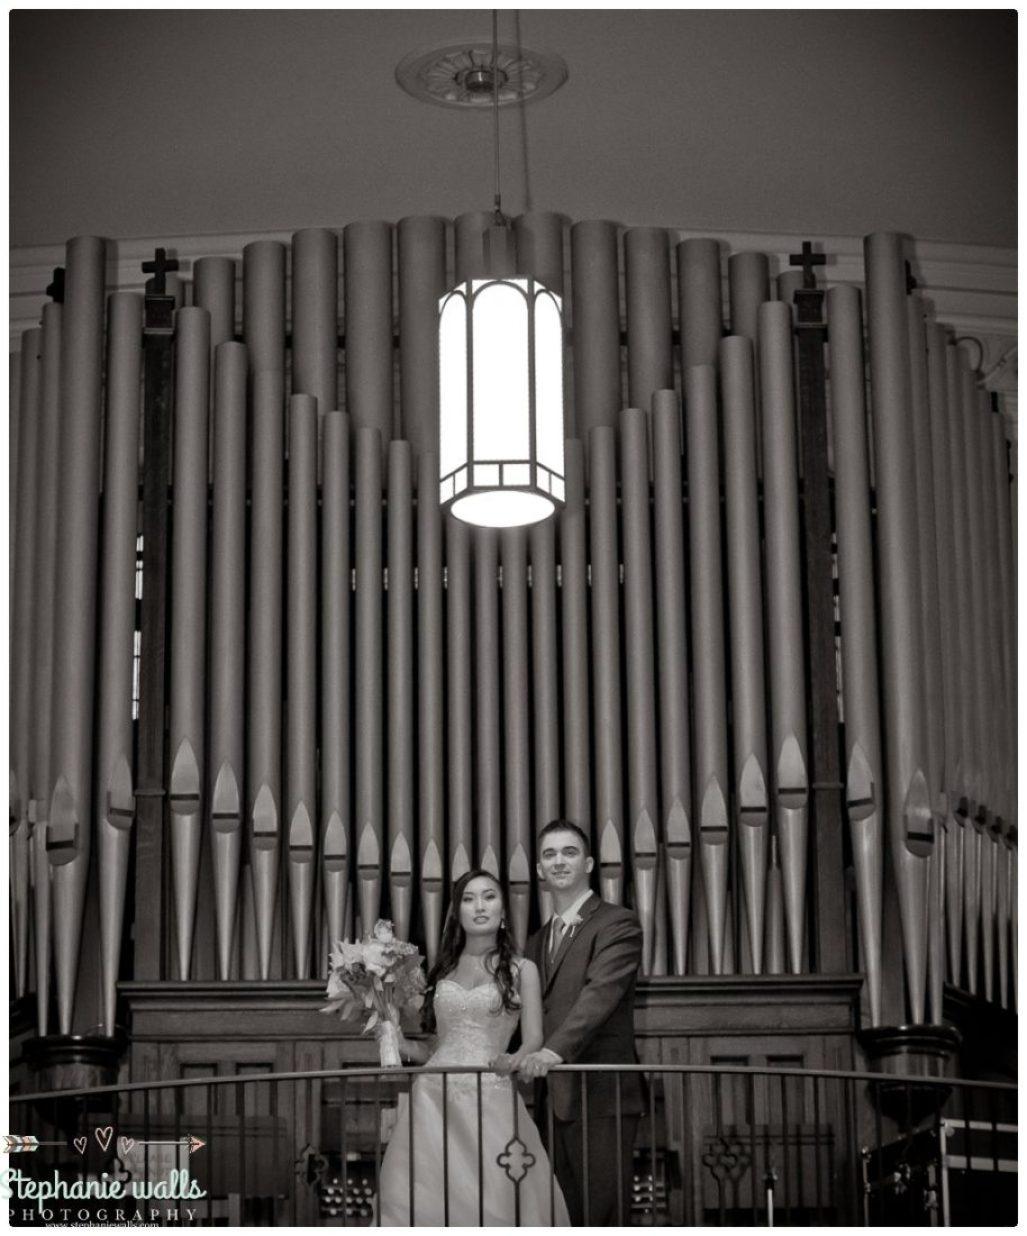 2016 06 19 0016 Cultural Love Wedding | Lady Perpetual Help Everett, Washington